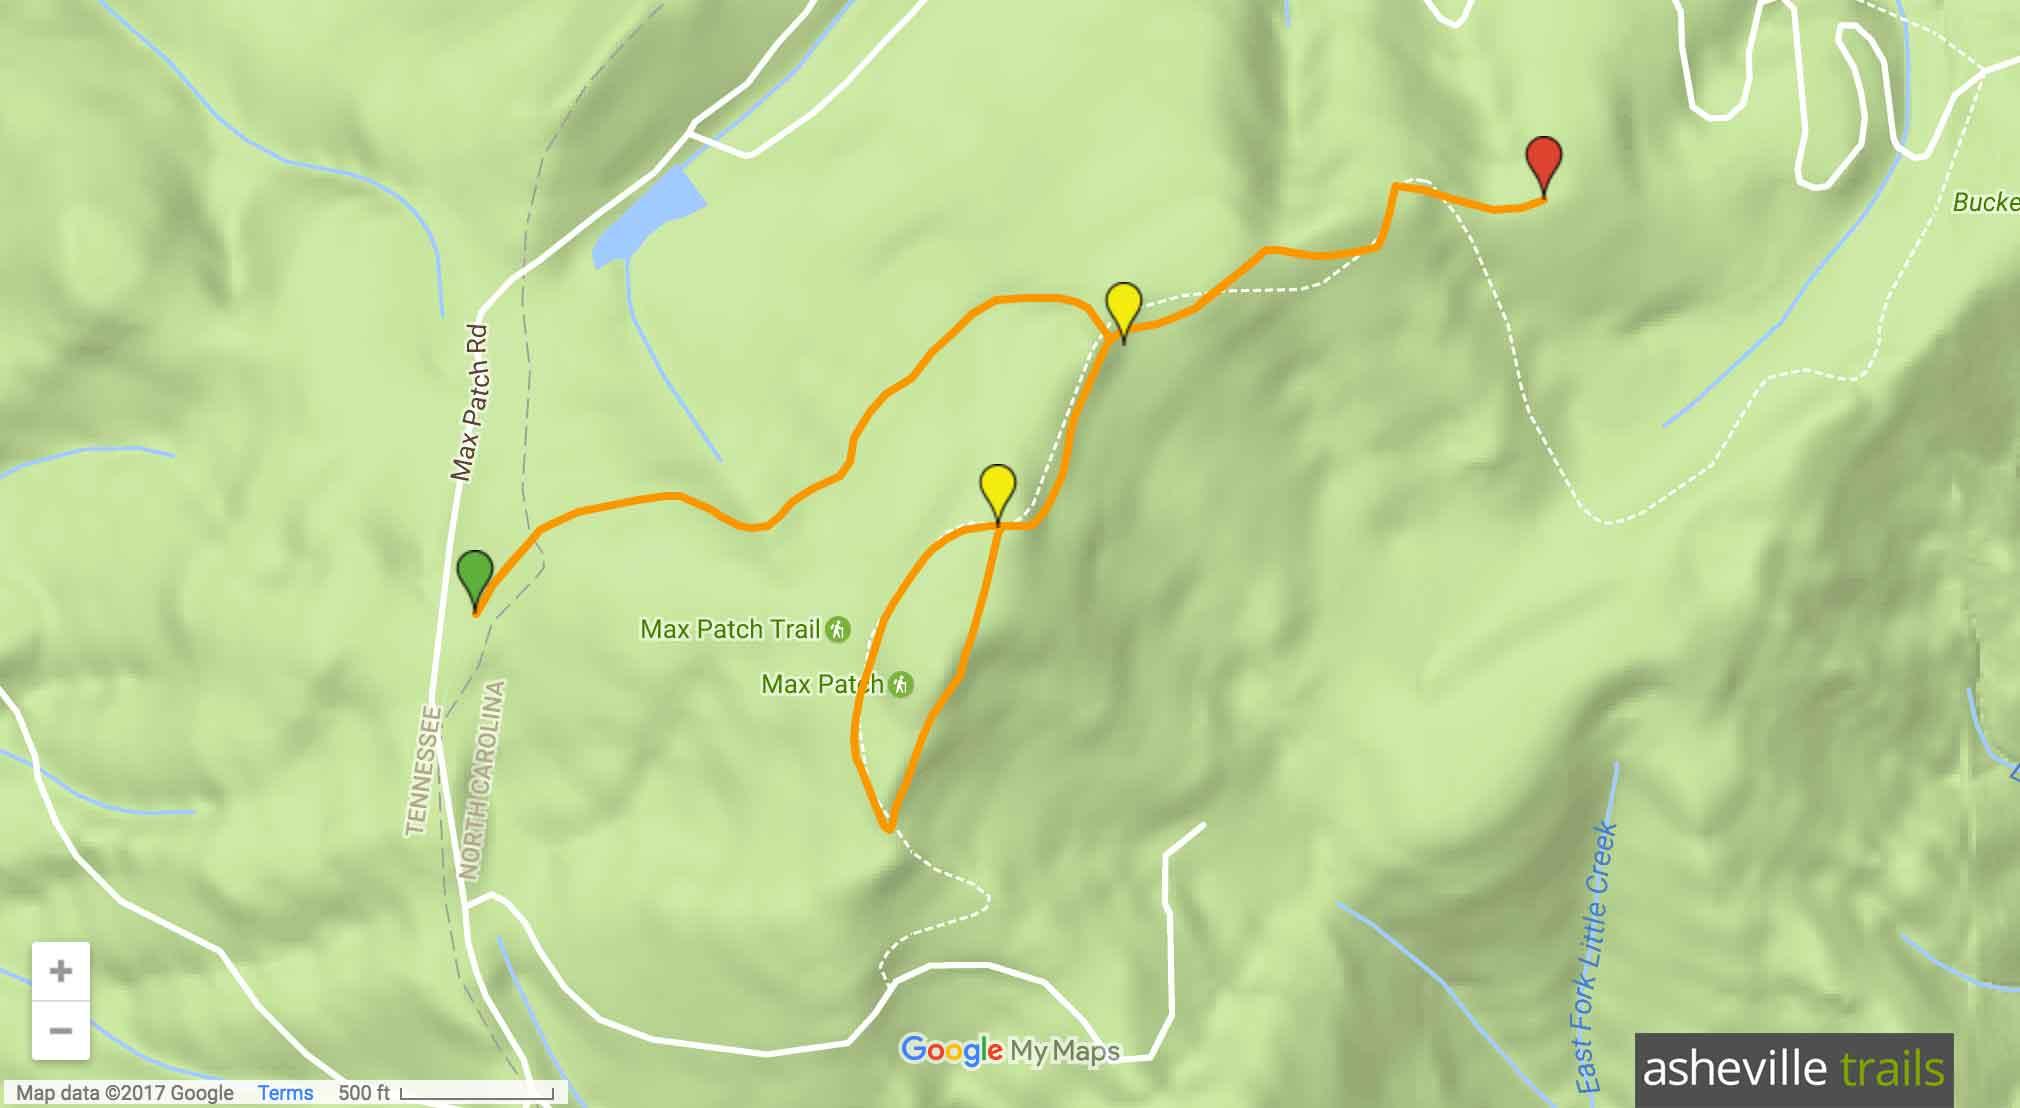 Appalachian Trail at Max Patch Map